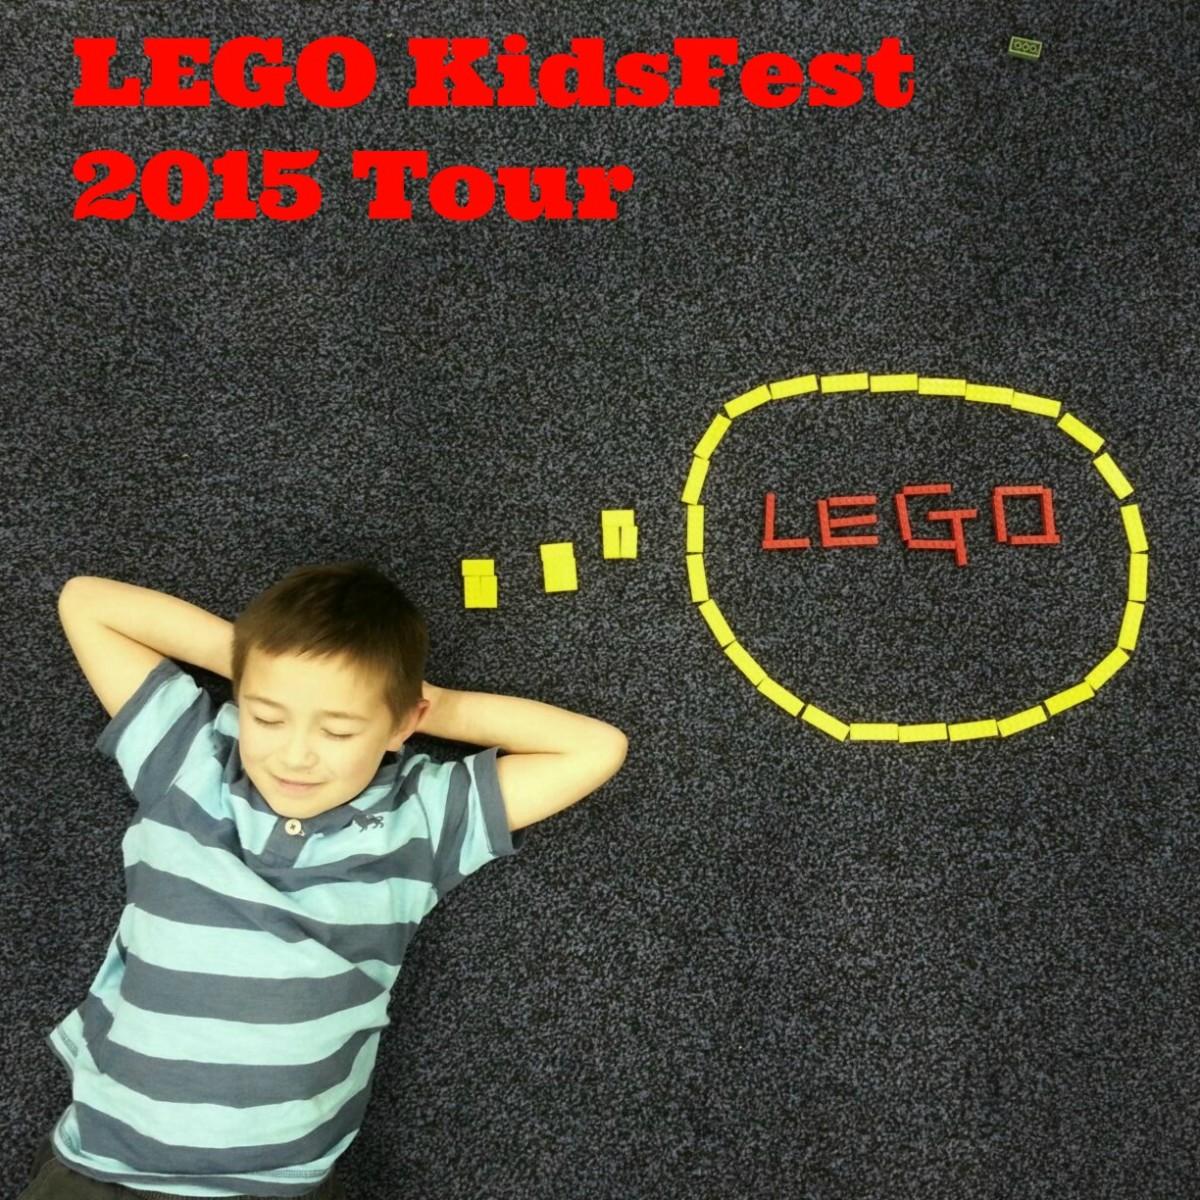 LEGO KidsFest 2015 Tour #LEGOKidsFest